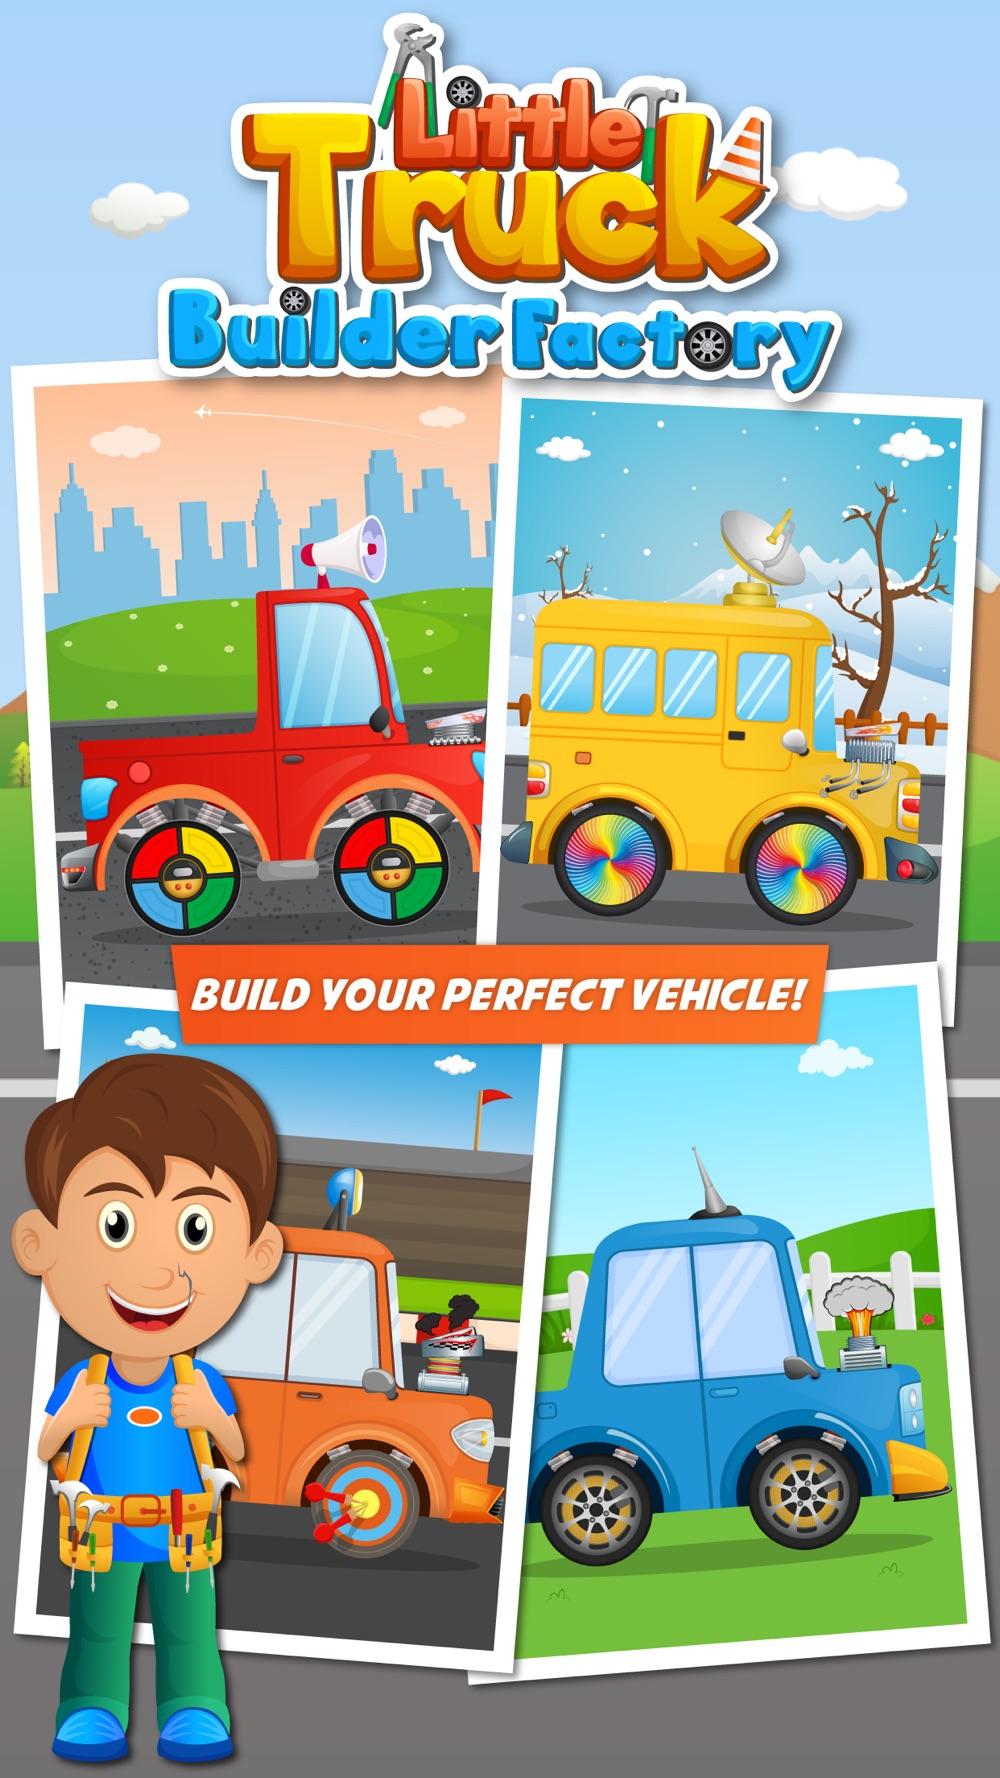 Little Truck Builder Factory- Vehicles and Trucks